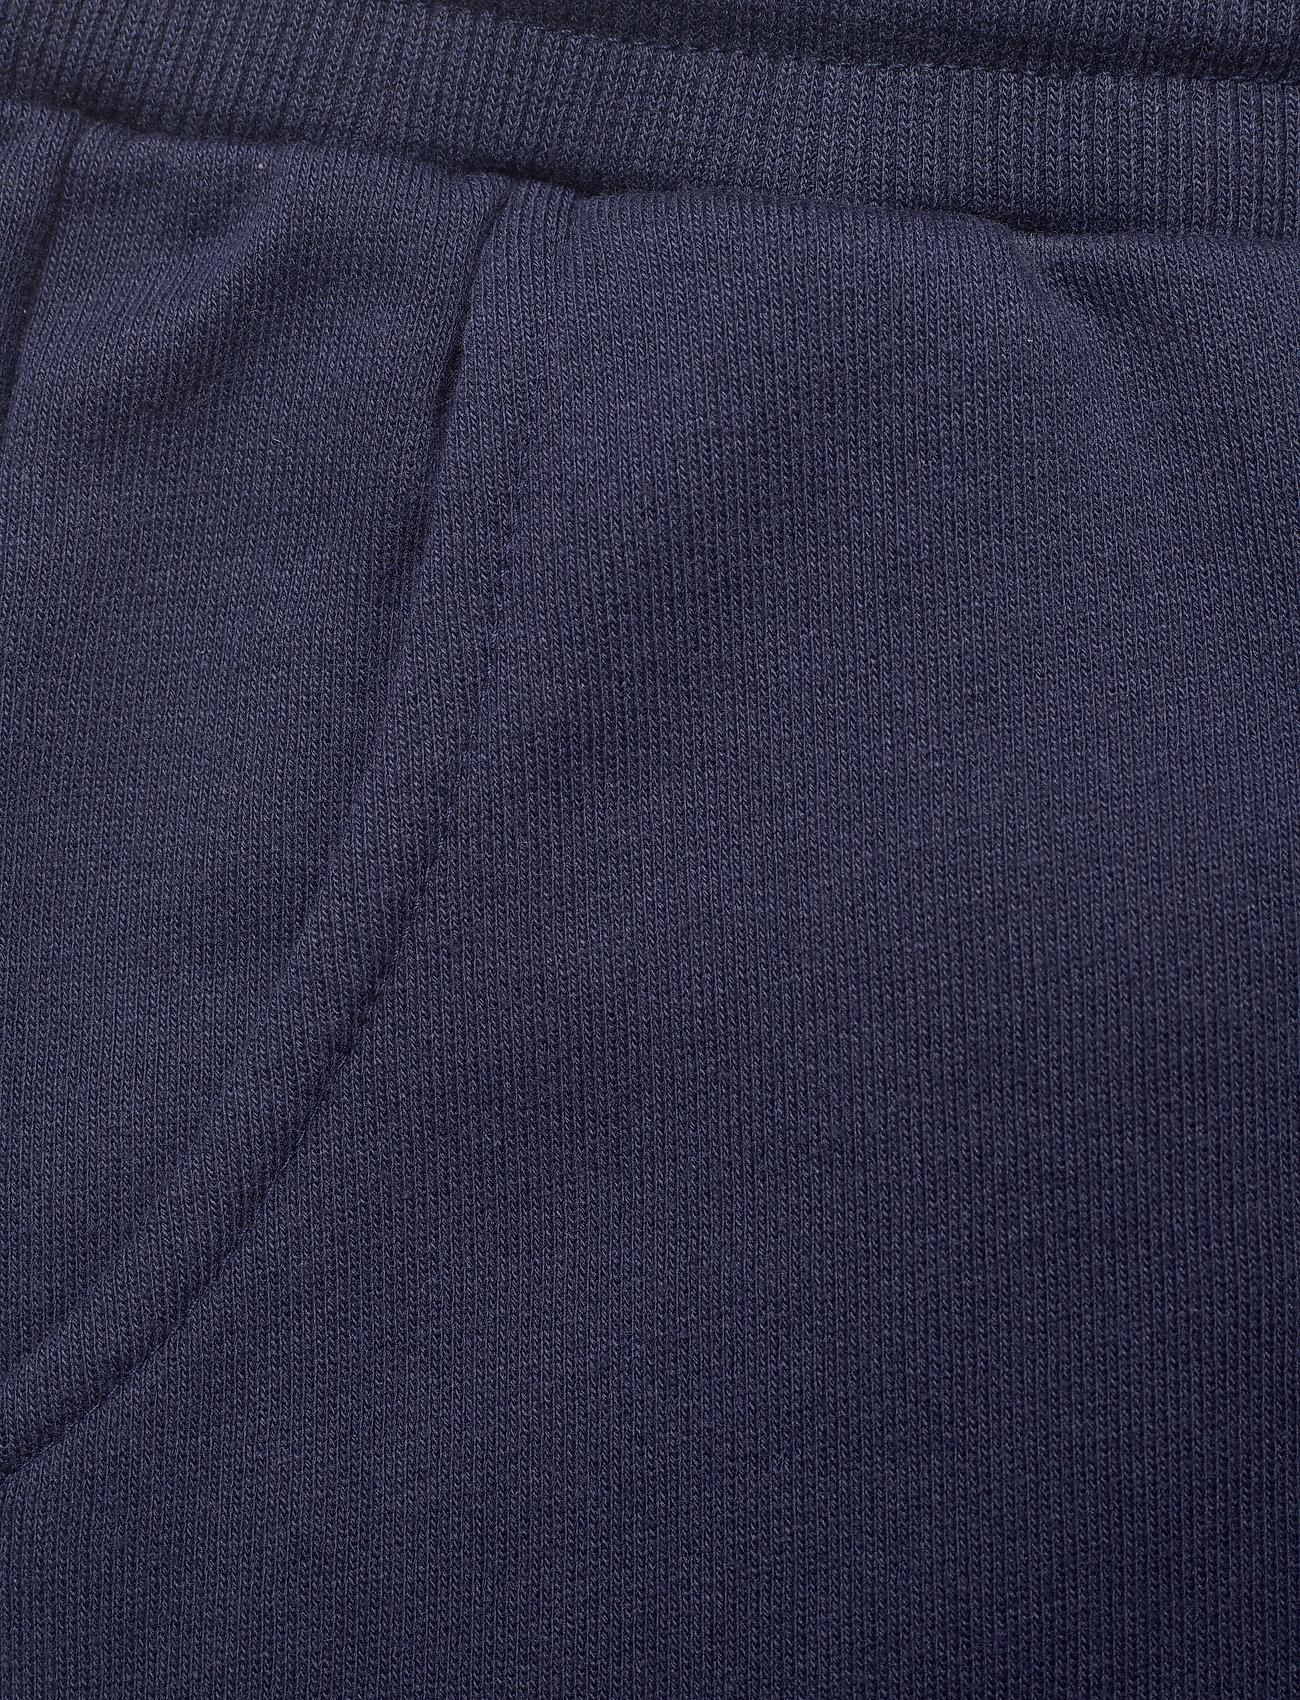 Mini A Ture - Even pants, K - joggingbroek - maritime blue - 2